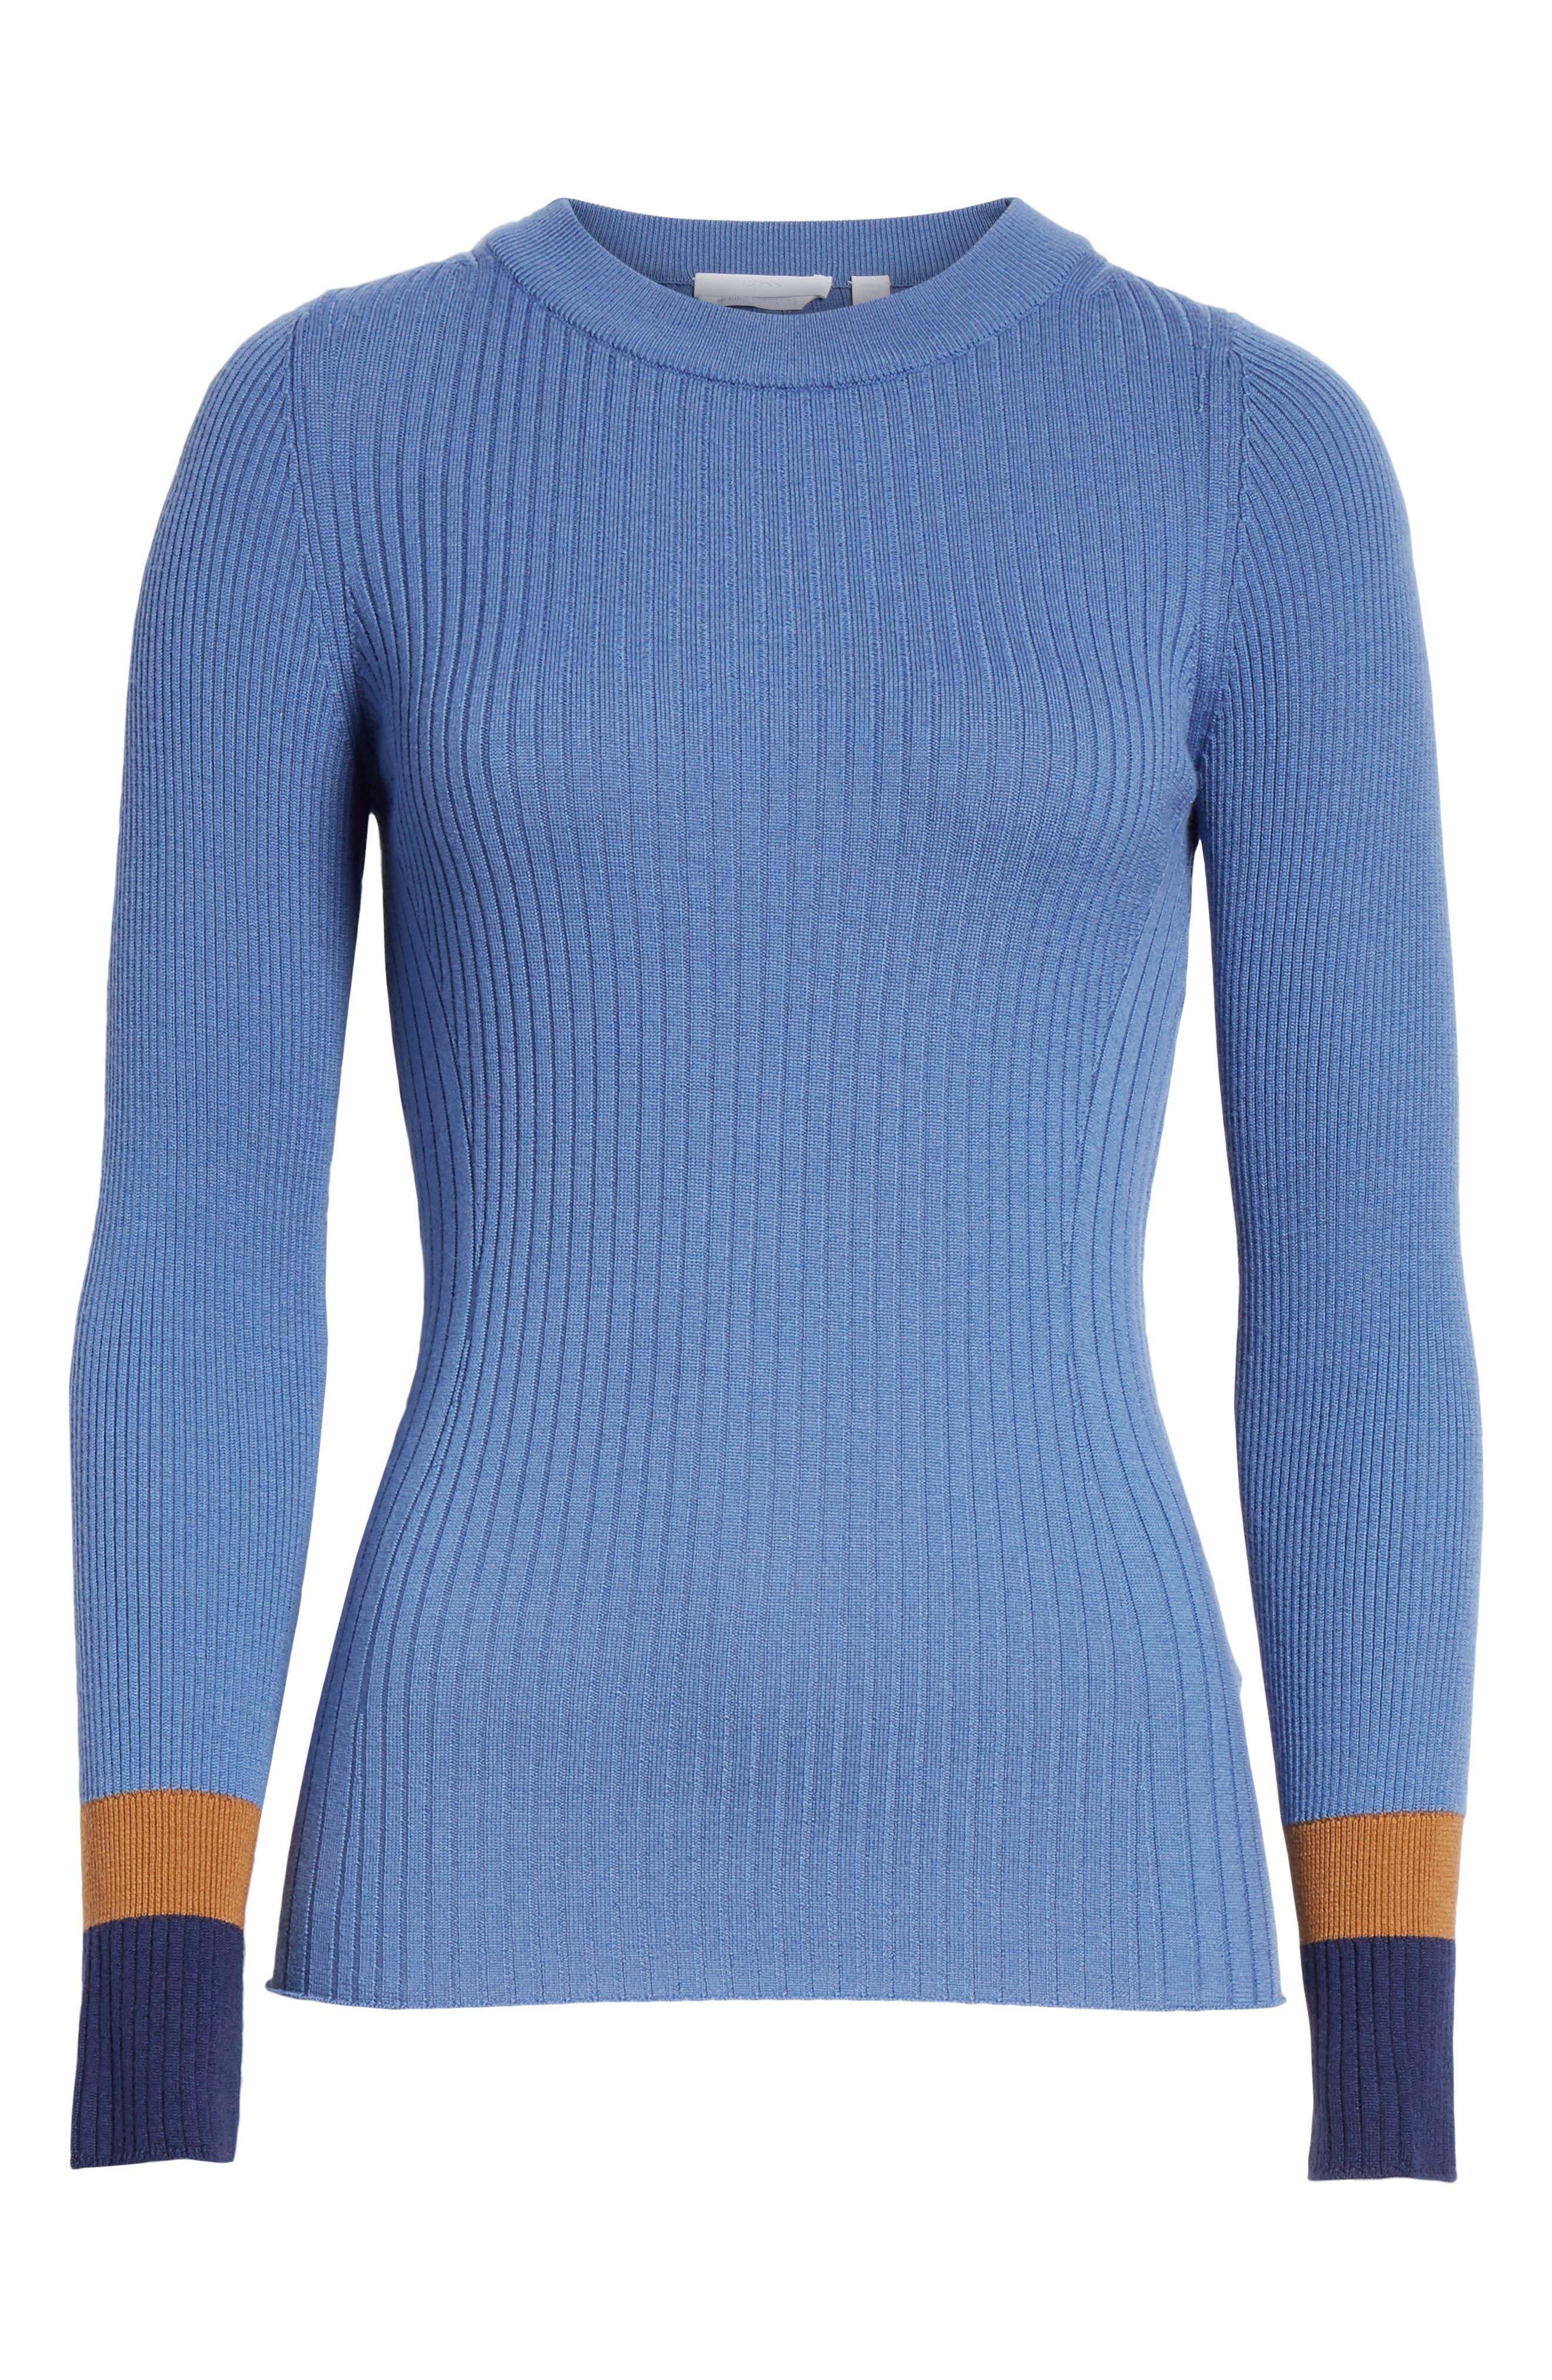 Fadeline Blue Fantasy Ribbed Wool Sweater,                             Alternate thumbnail 6, color,                             SOFT BLUE FANTASY